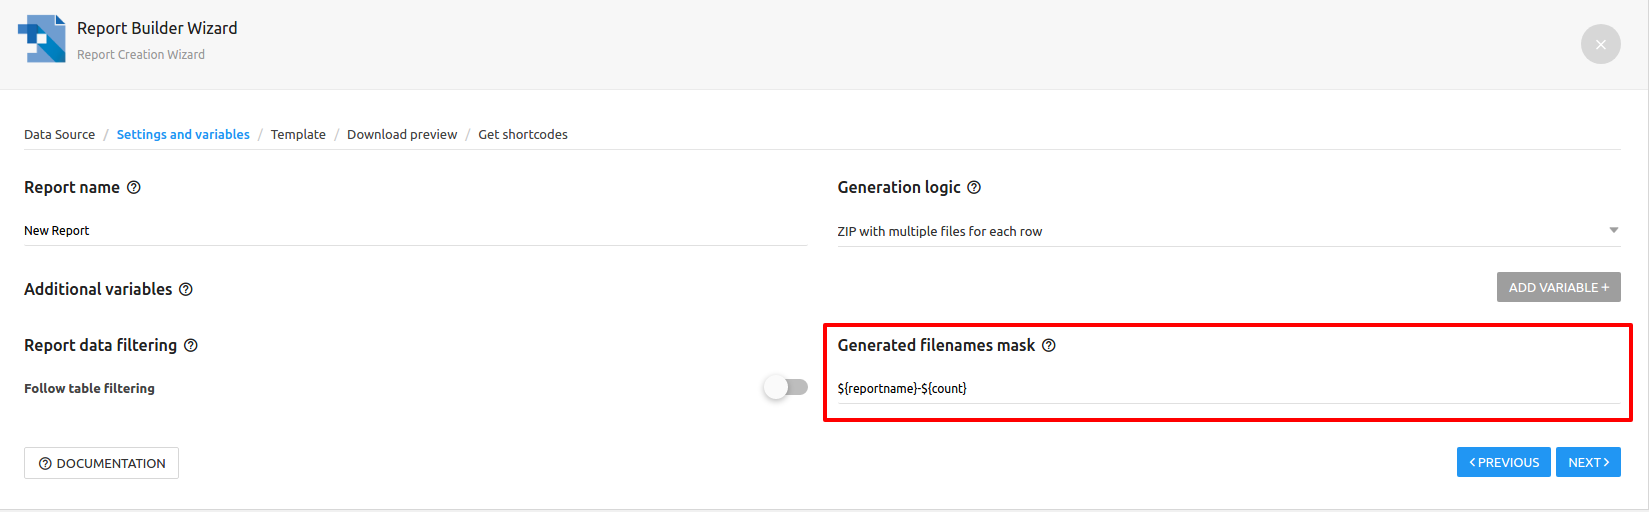 Filenames Masks for Multiple file reports